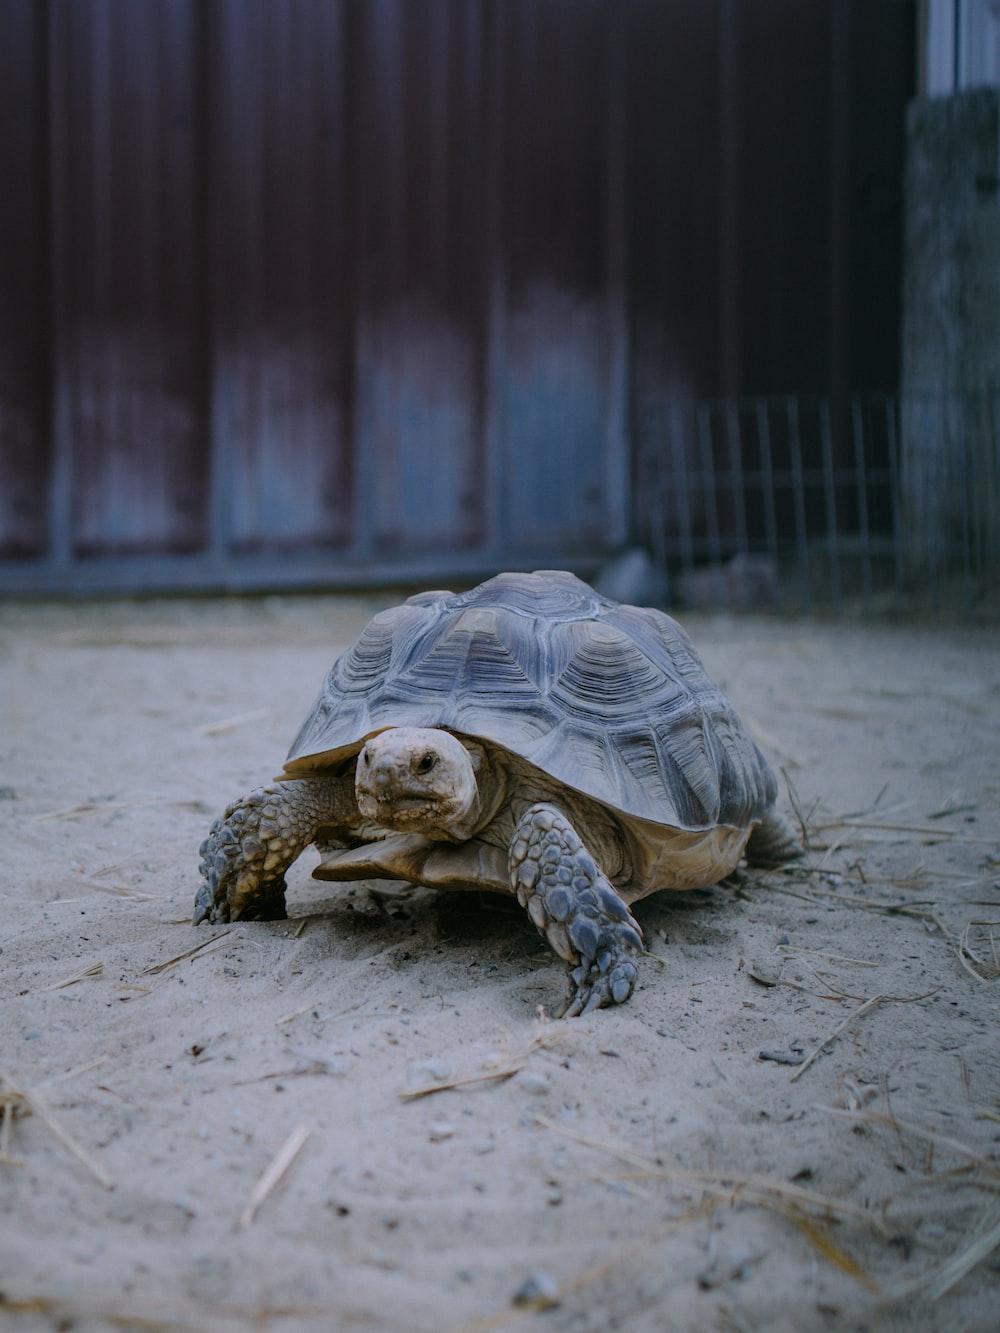 brown turtle on gray concrete floor